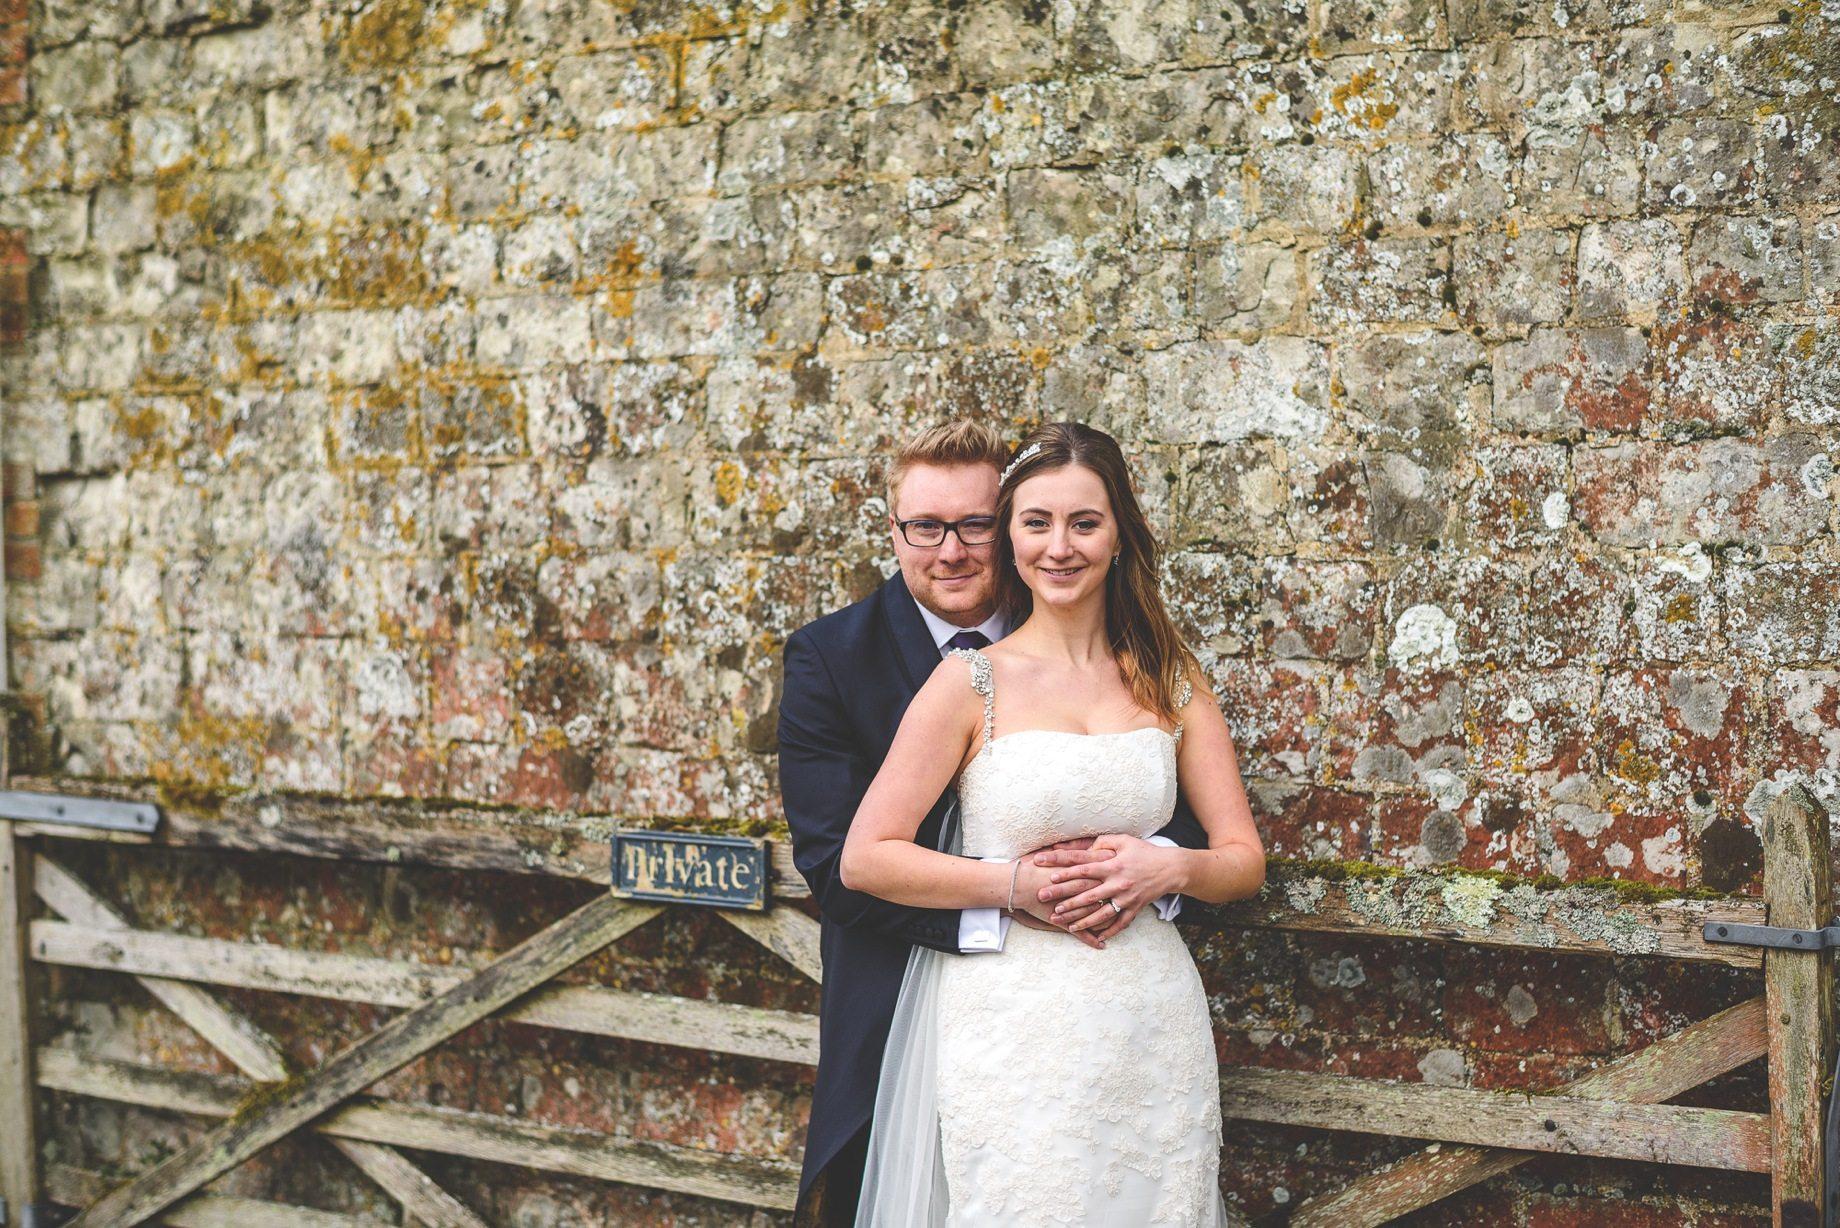 Heather and Chris - Hampshire wedding photography (108 of 174)